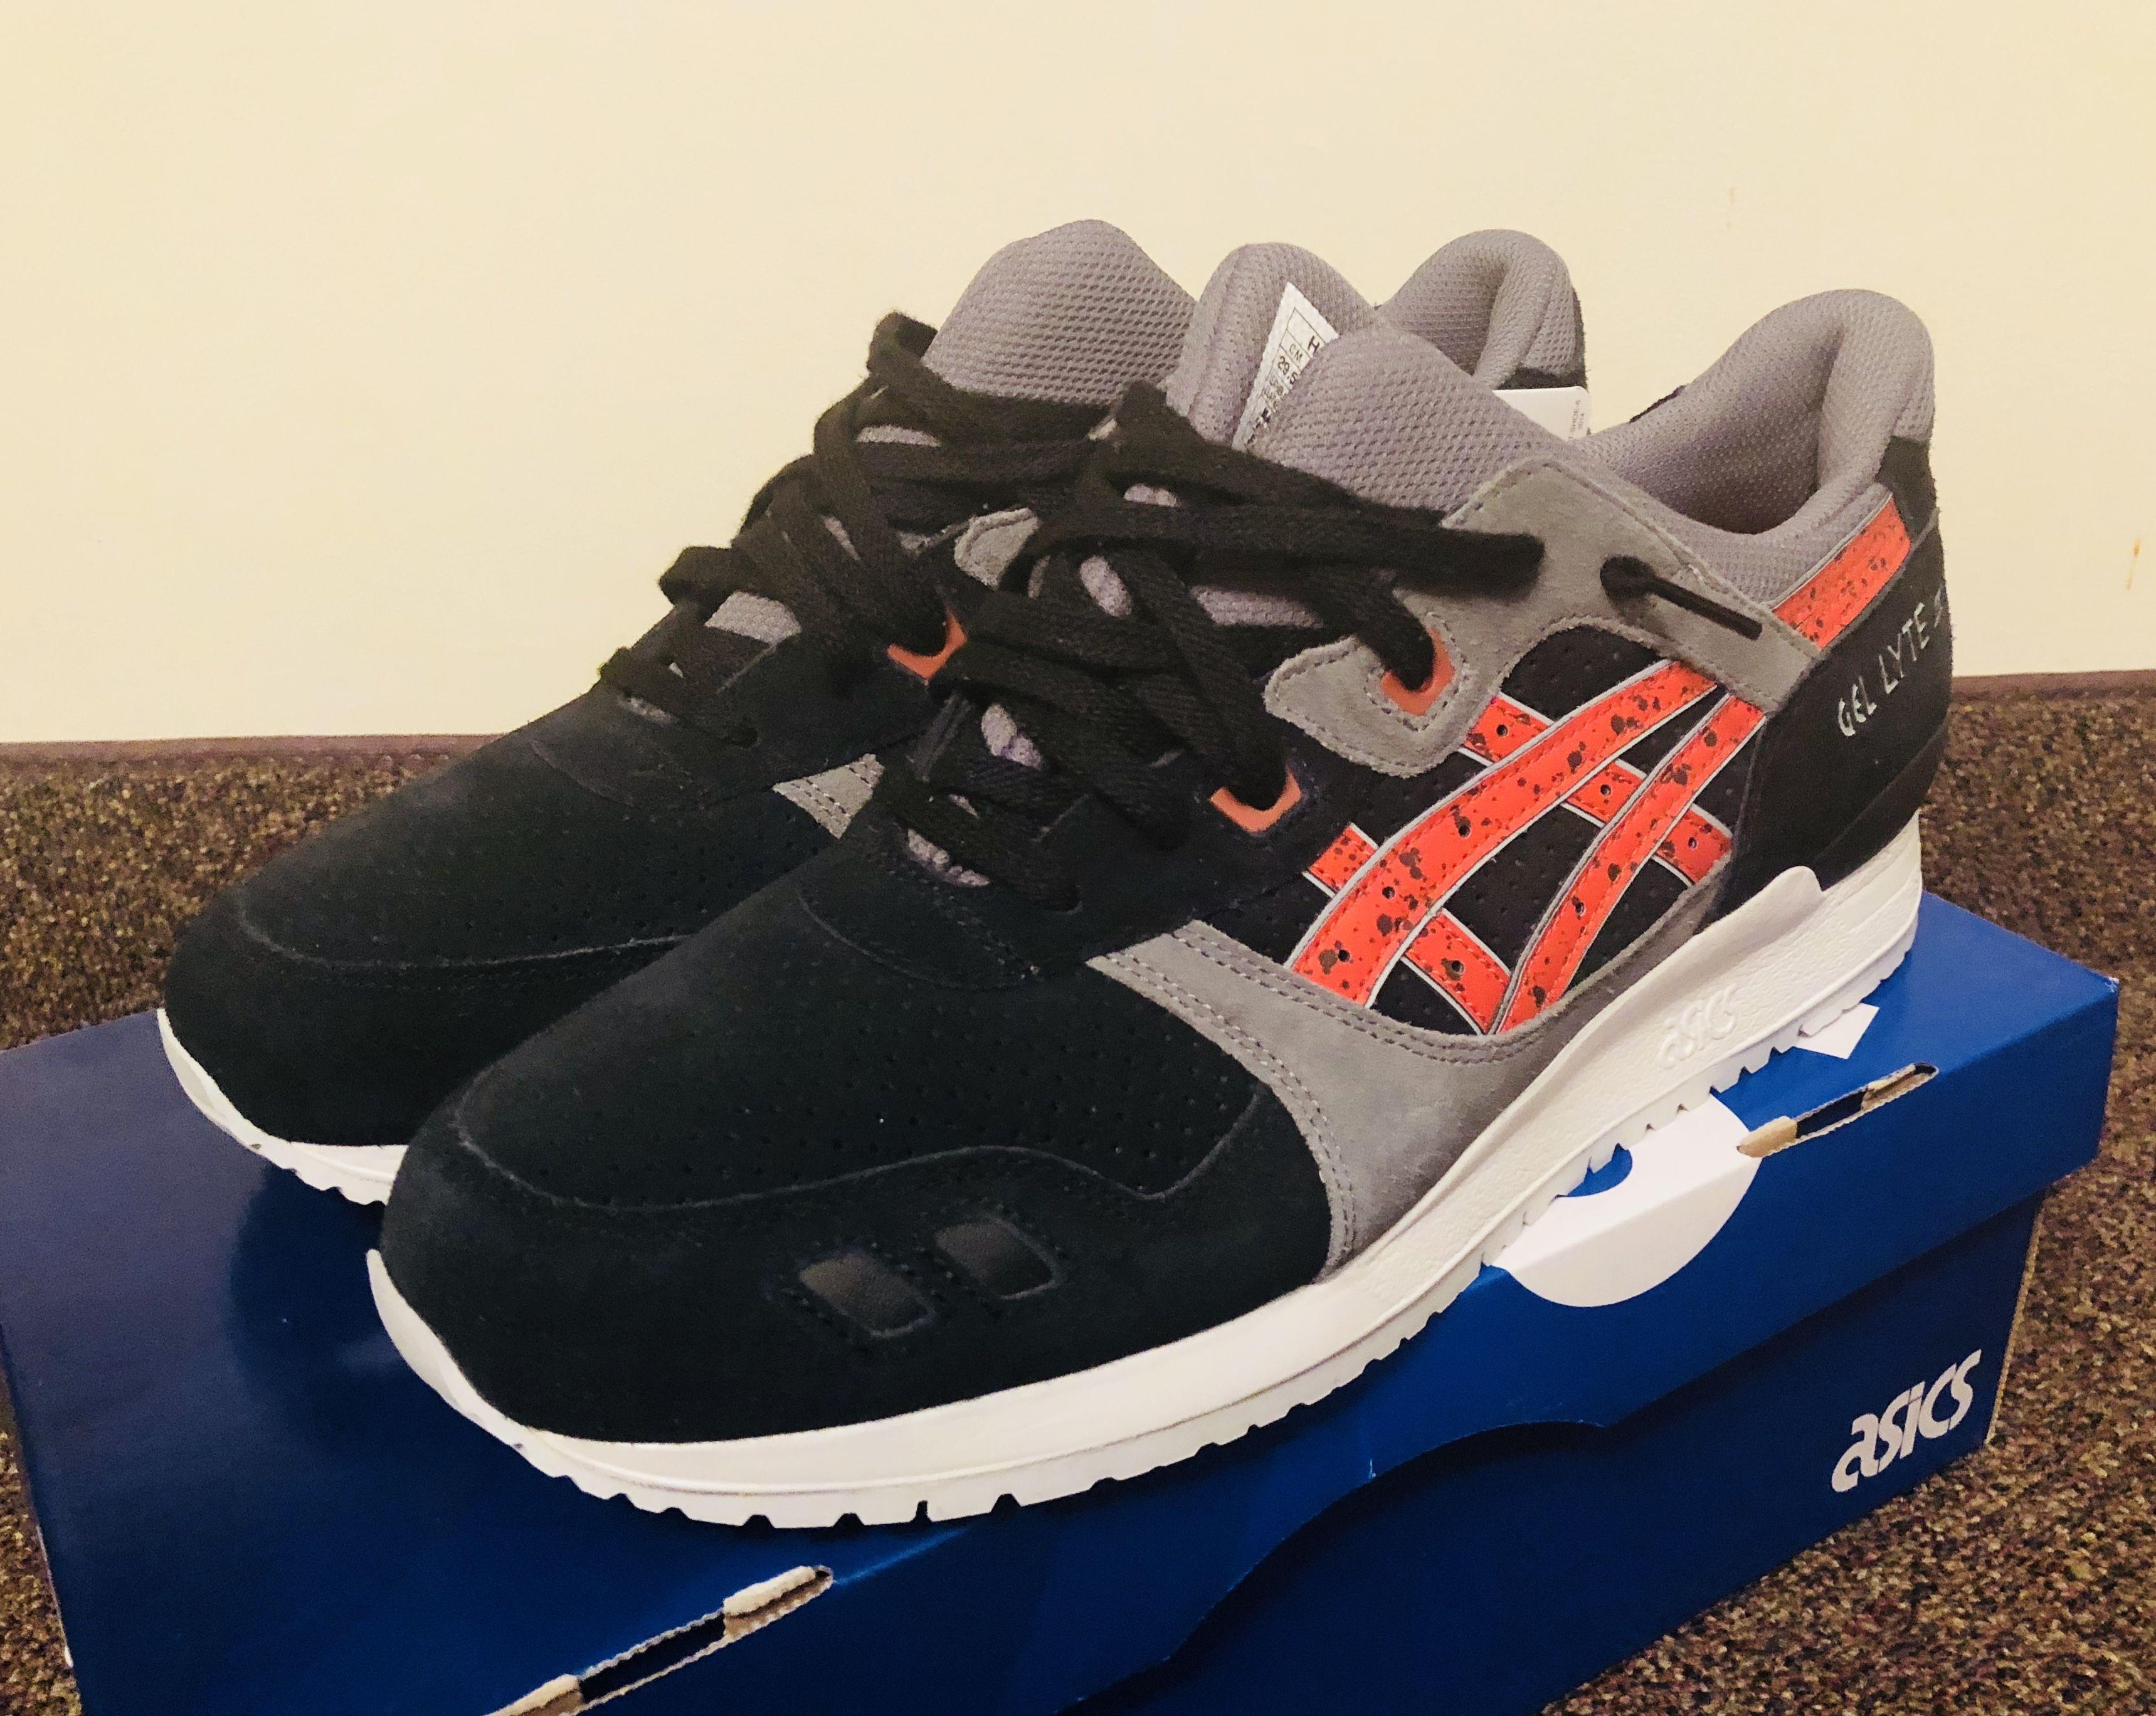 Asics Gel Tiger Men Gel Lyte | III noir chili # sneakers sneakers occasionnels | fb14329 - madridturismobitcoin.website